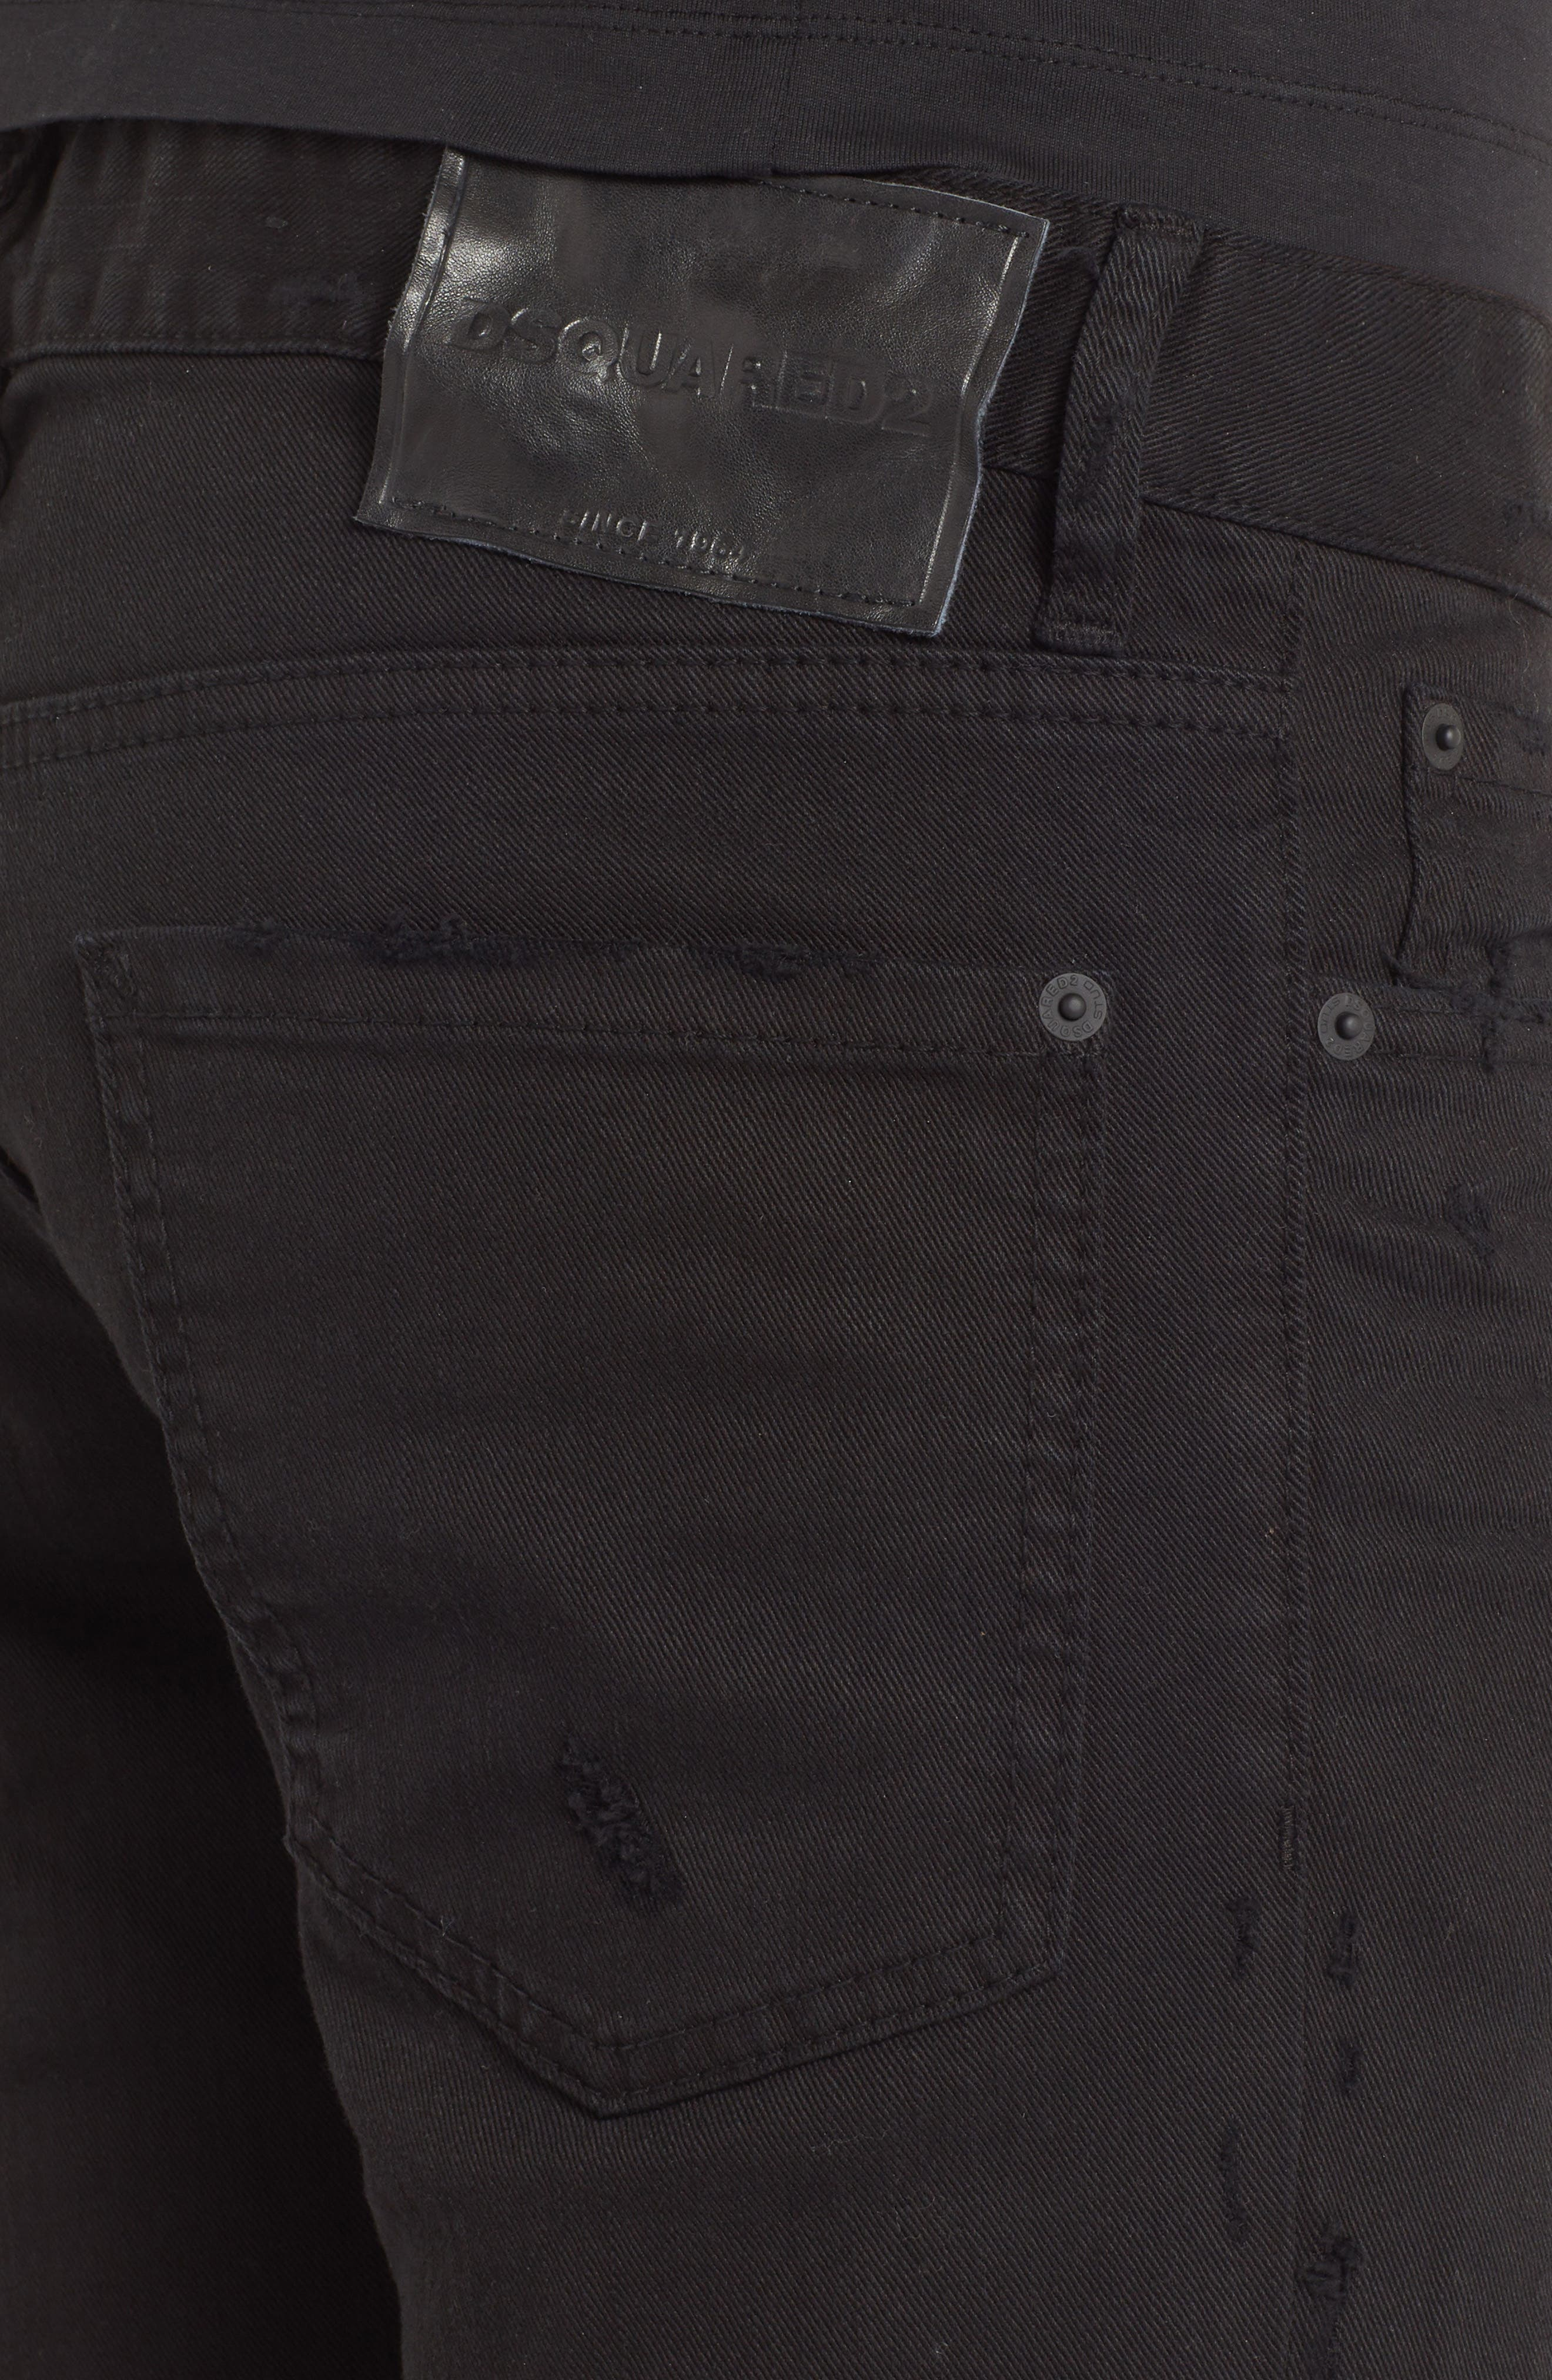 Destroyed Slim Fit Jeans,                             Alternate thumbnail 4, color,                             BLACK